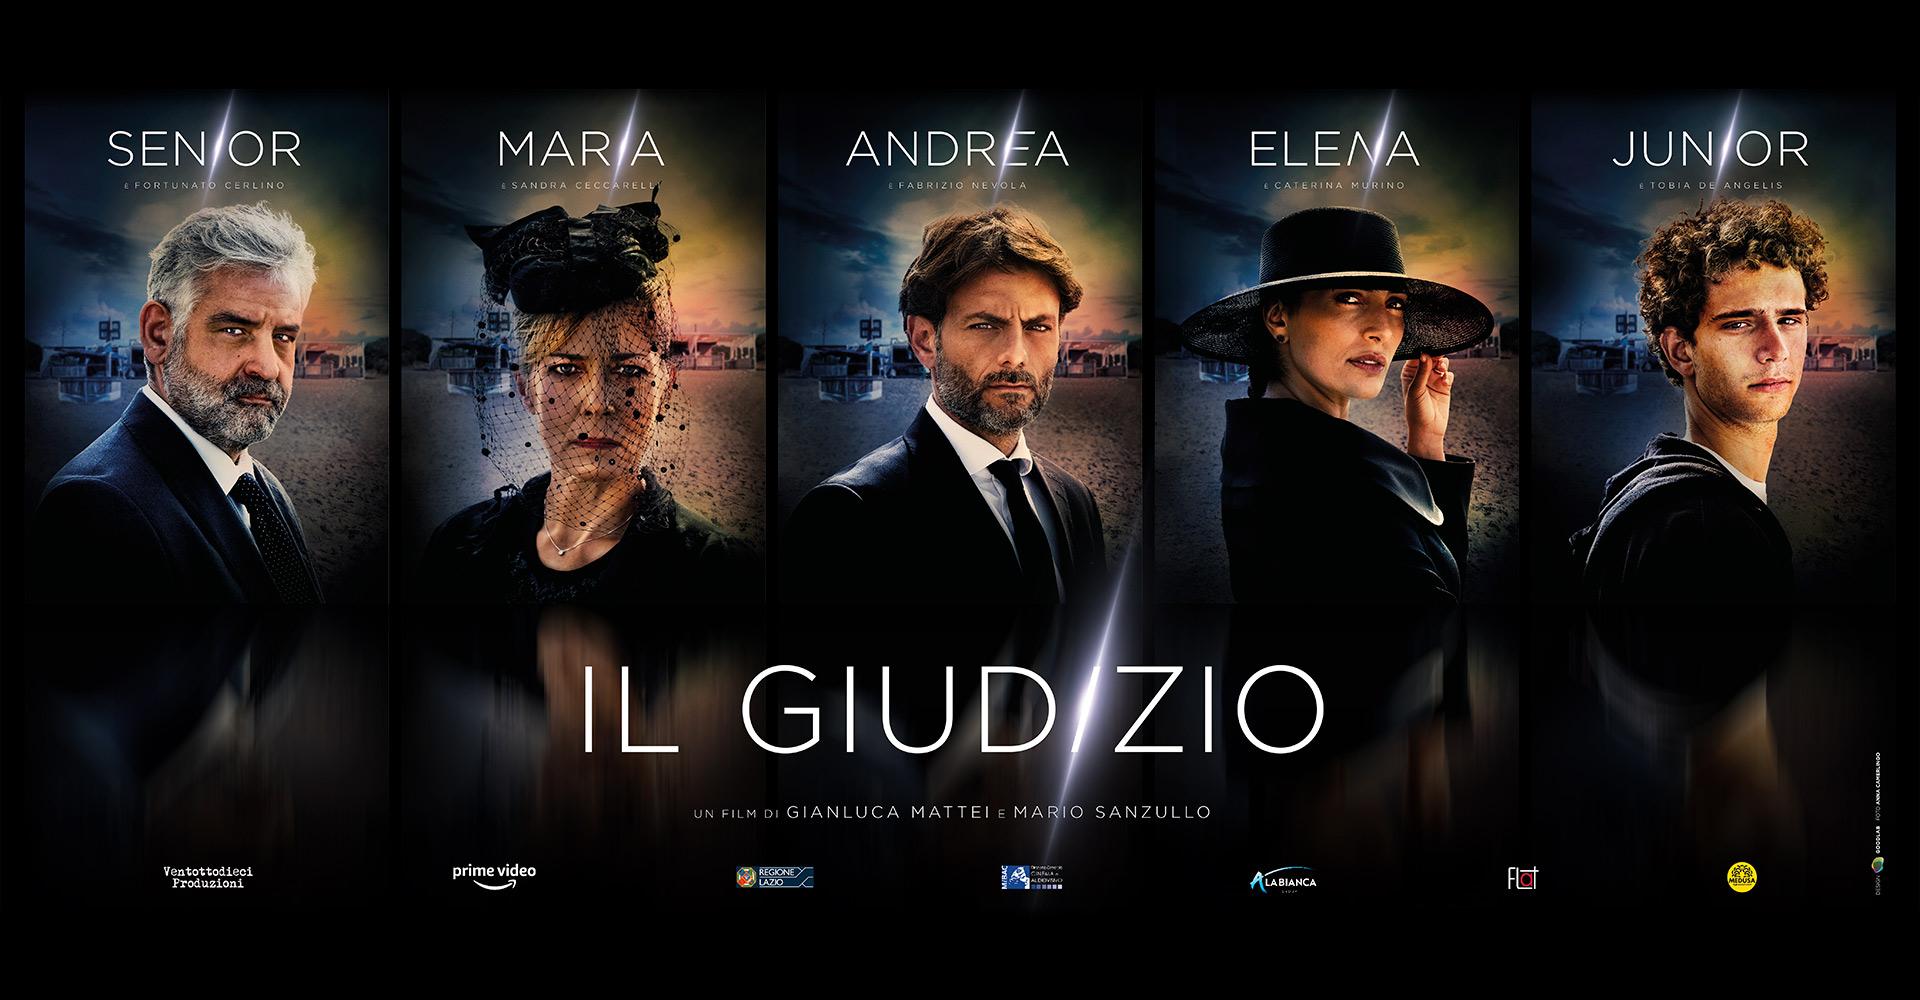 IlGiudizio_Behance_02